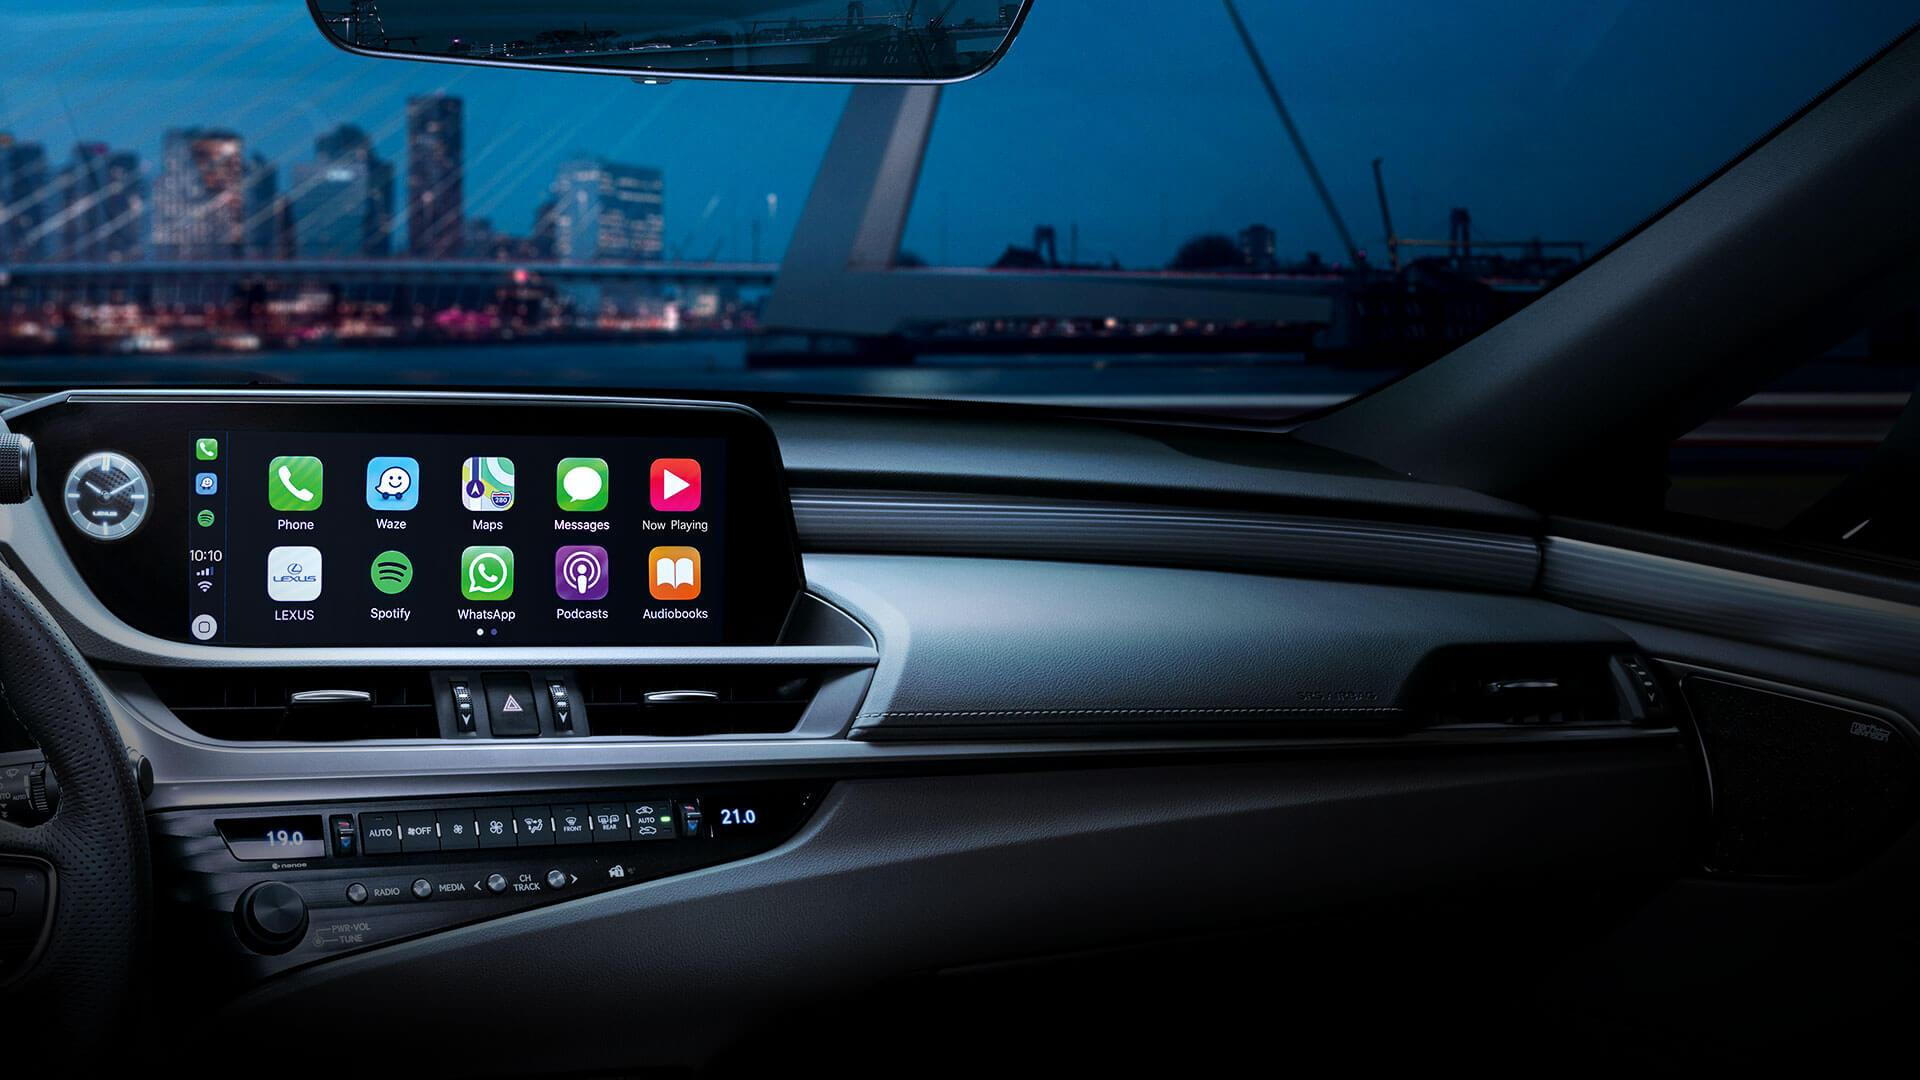 2020 lexus es key features carplay